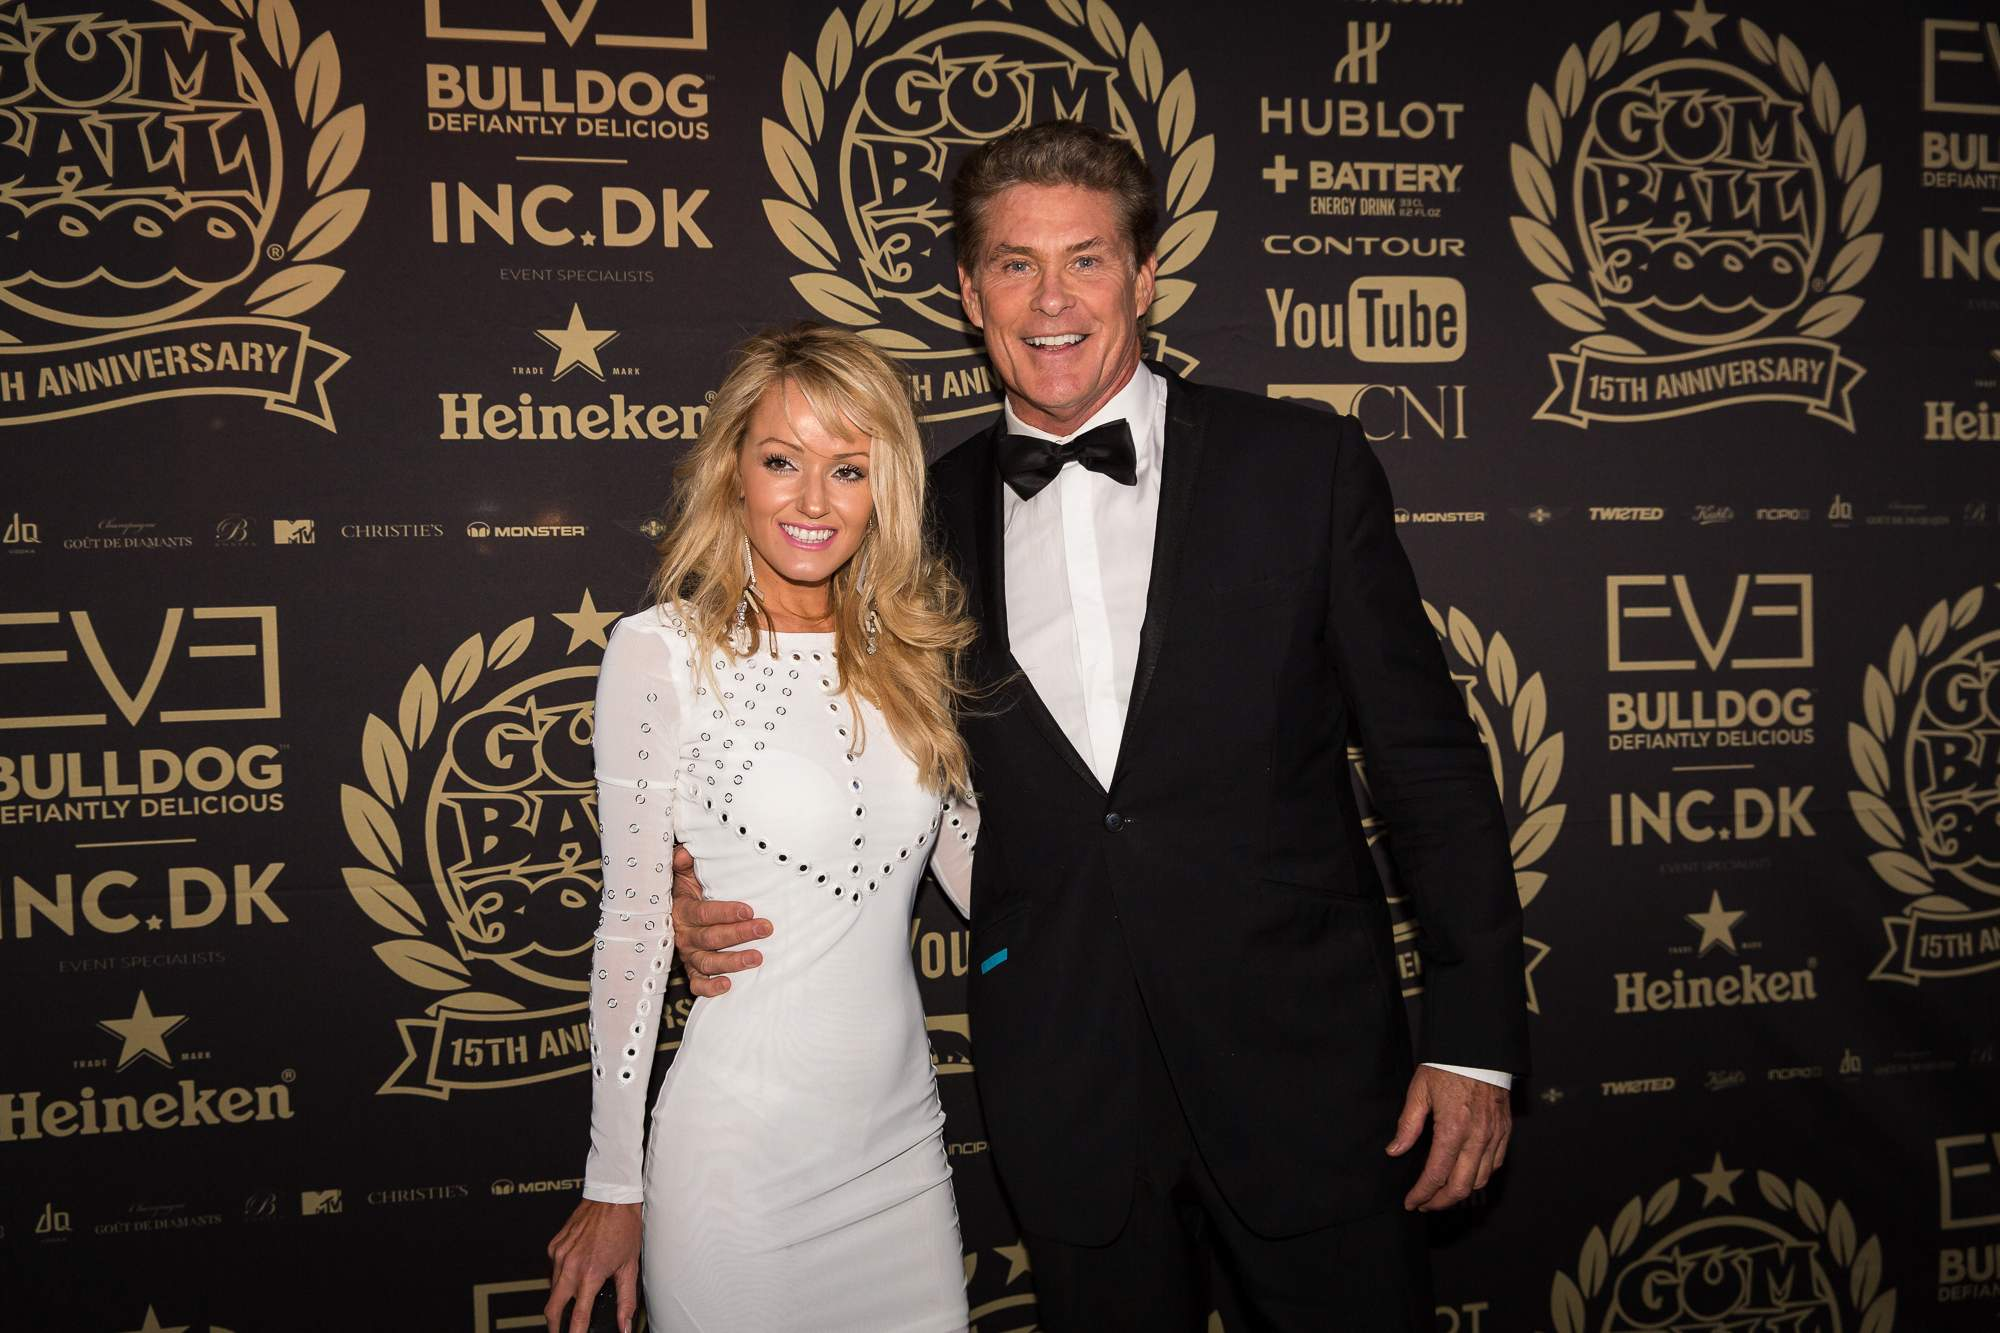 David Hasselhoff and Hailey